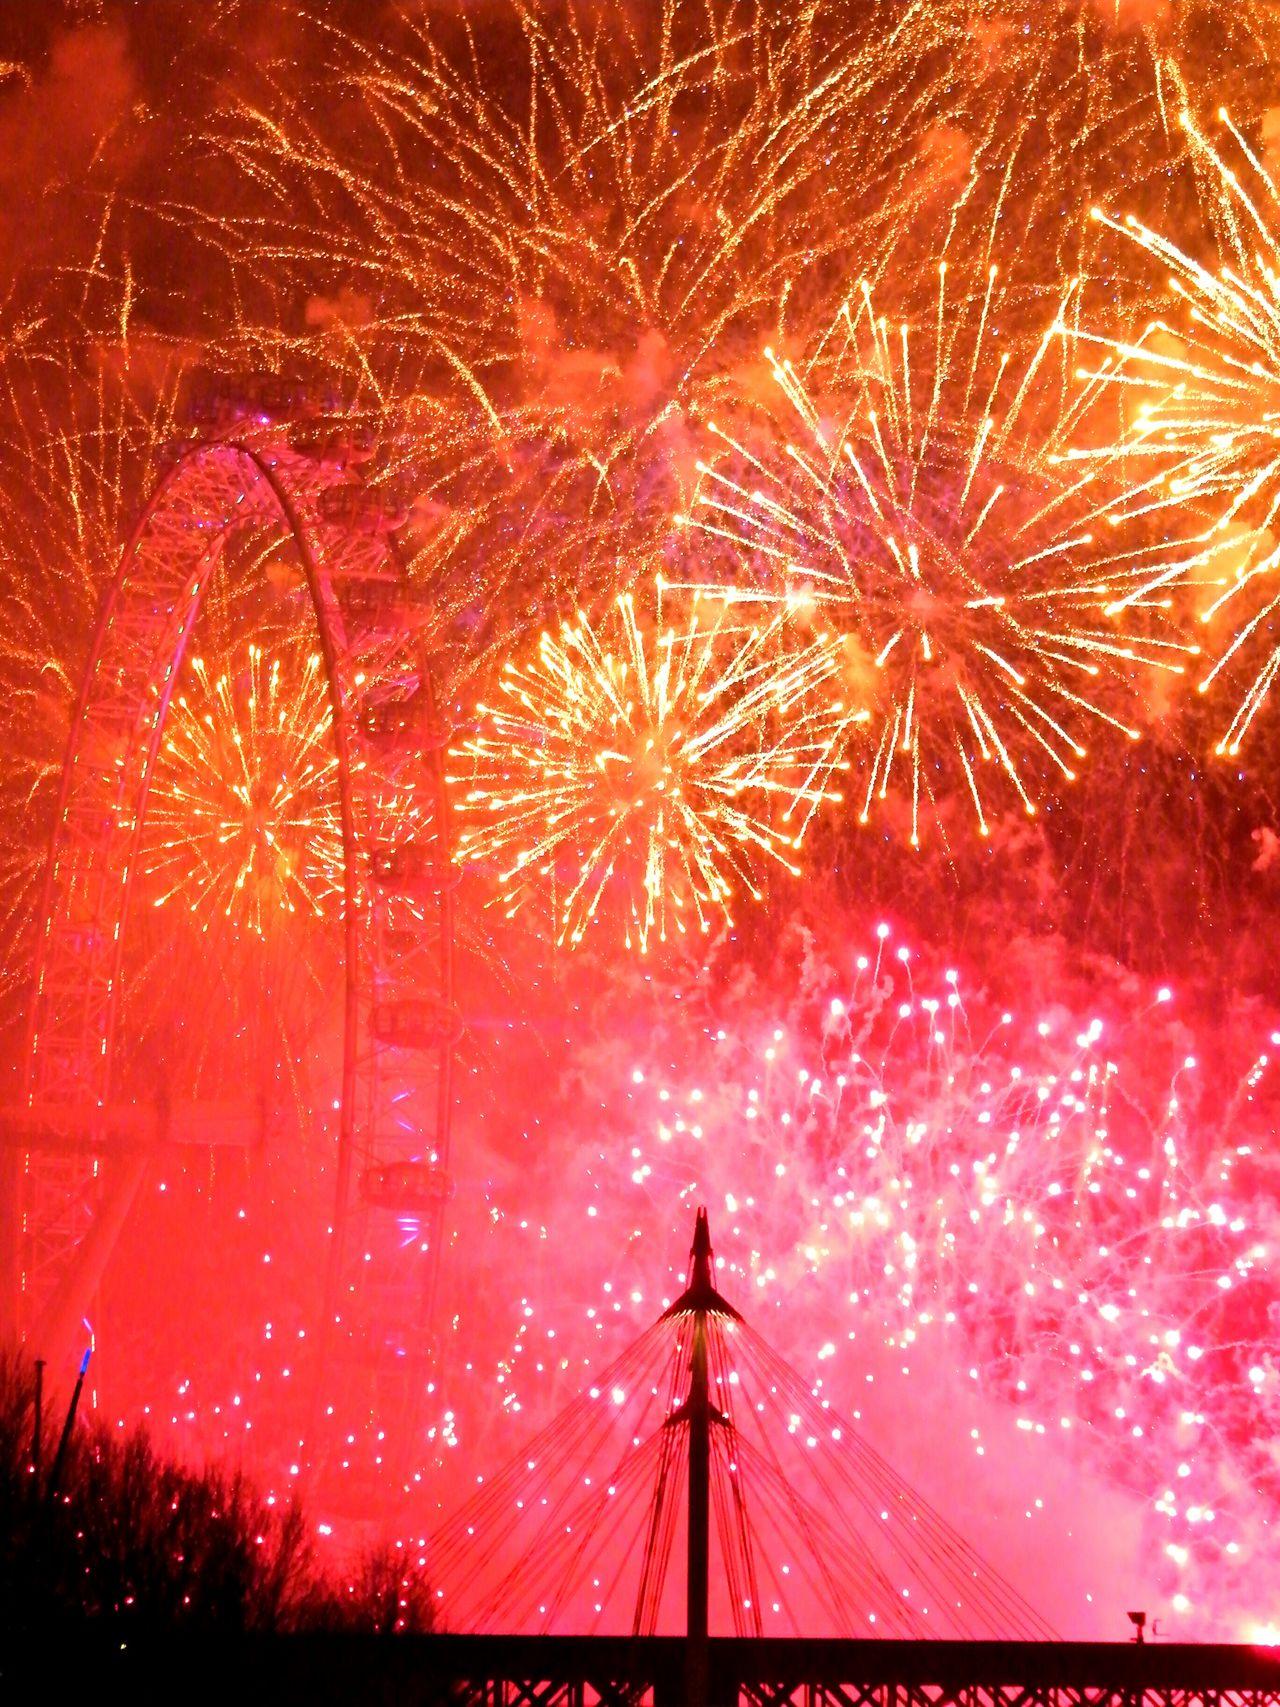 My Year My View London LONDON❤ London Eye Firework Fireworks Multi Colored Firework Display Illuminated Ferris Wheel Exploding Sky Night Firework - Man Made Object No People Event Motion Great Britain Großbritannien Feuerwerk Explosion Celebration